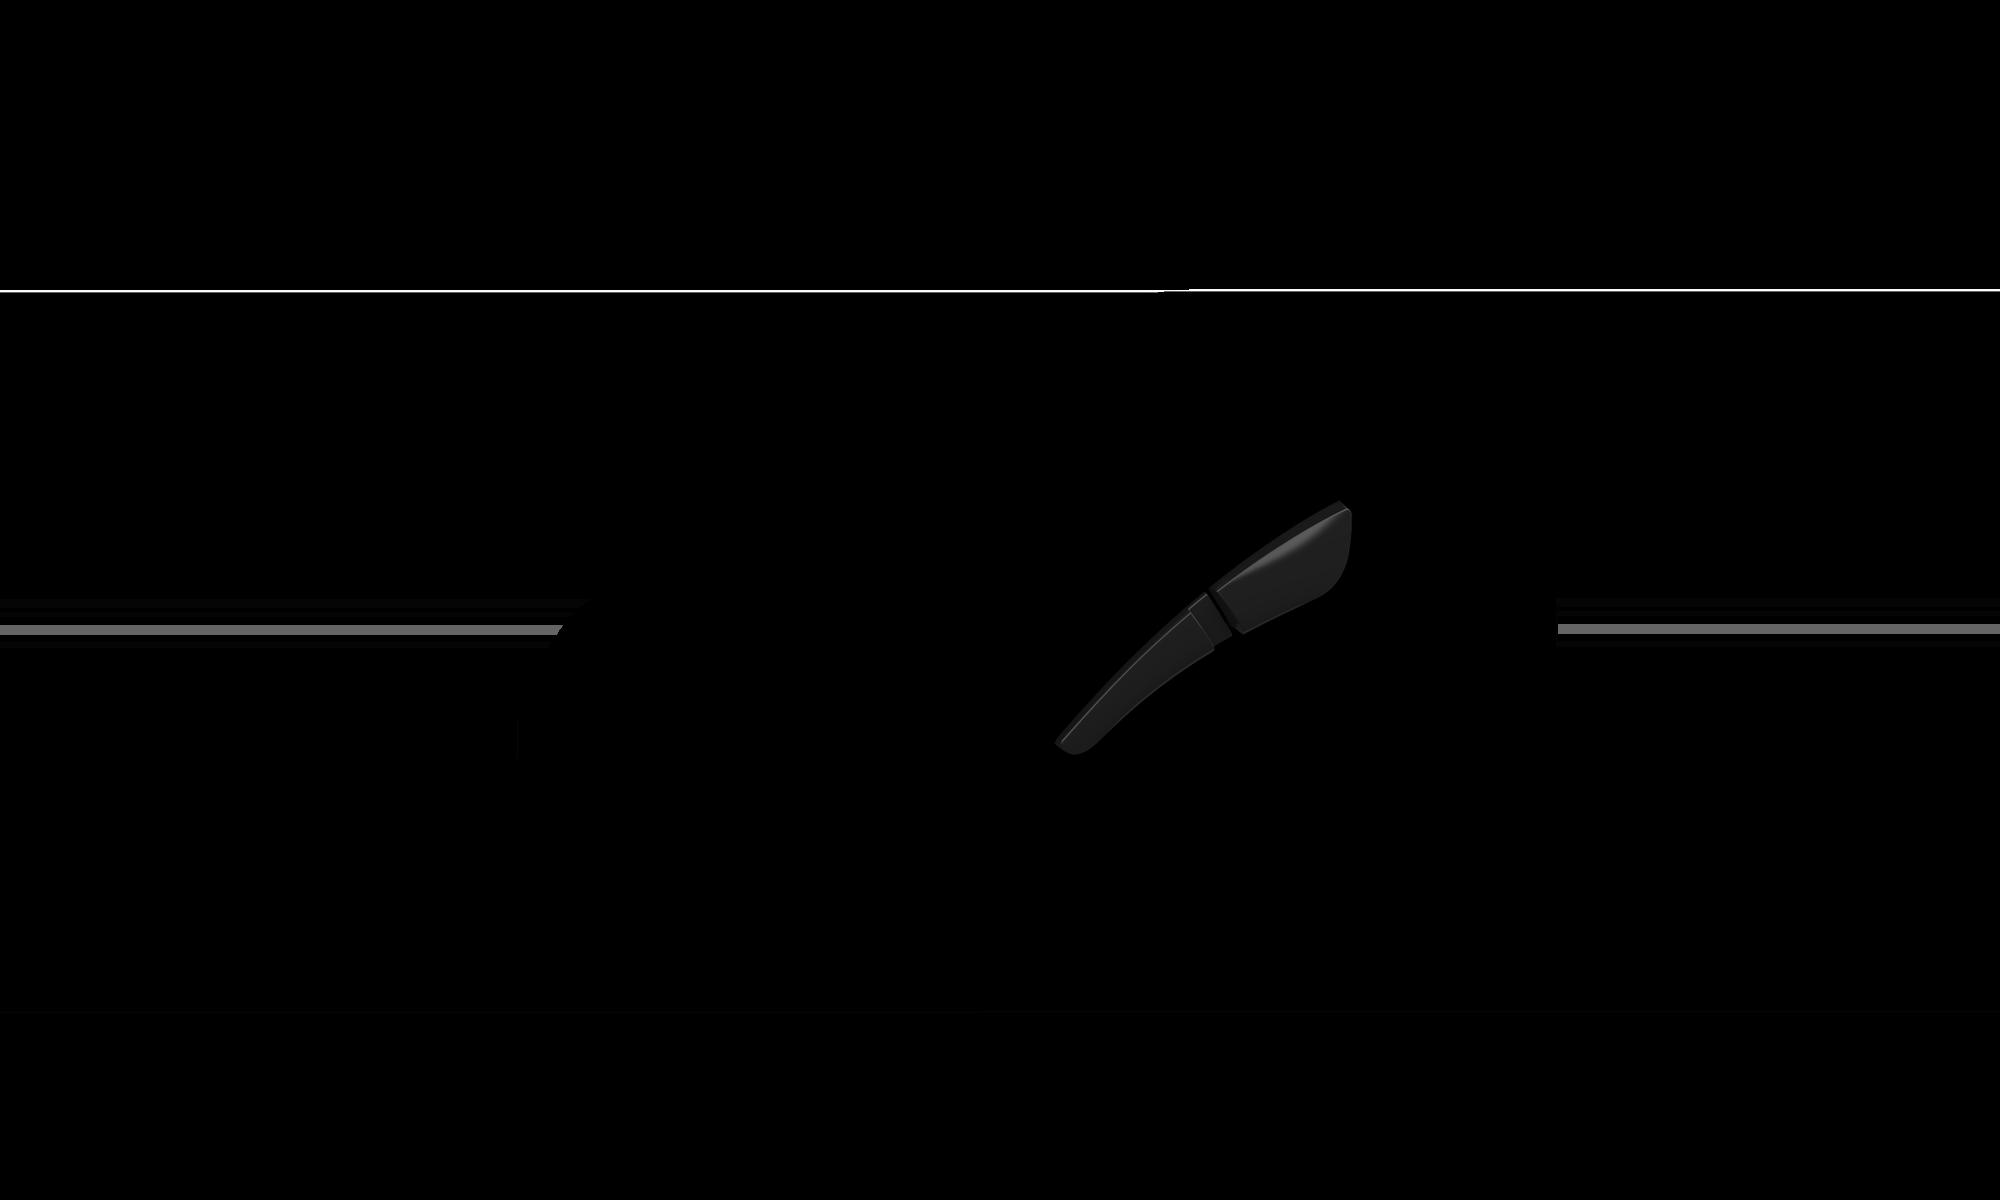 Logitech G703 | Logitech Wireless Mouse